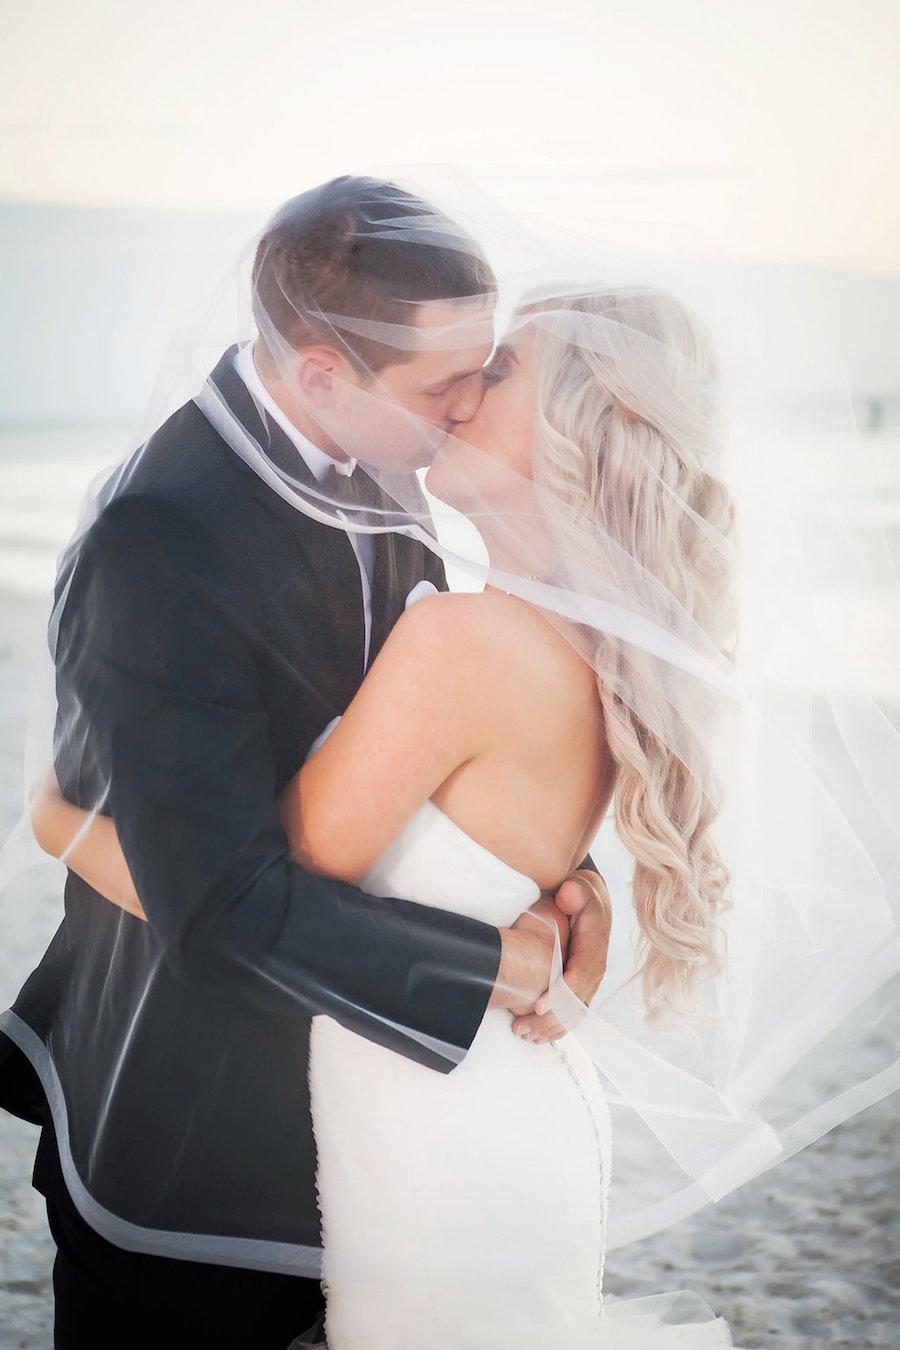 St Pete Beach Bride and Groom Wedding Kissing Portrait Under Veil   Don CeSar Wedding   St Pete Wedding Photographer Limelight Photography